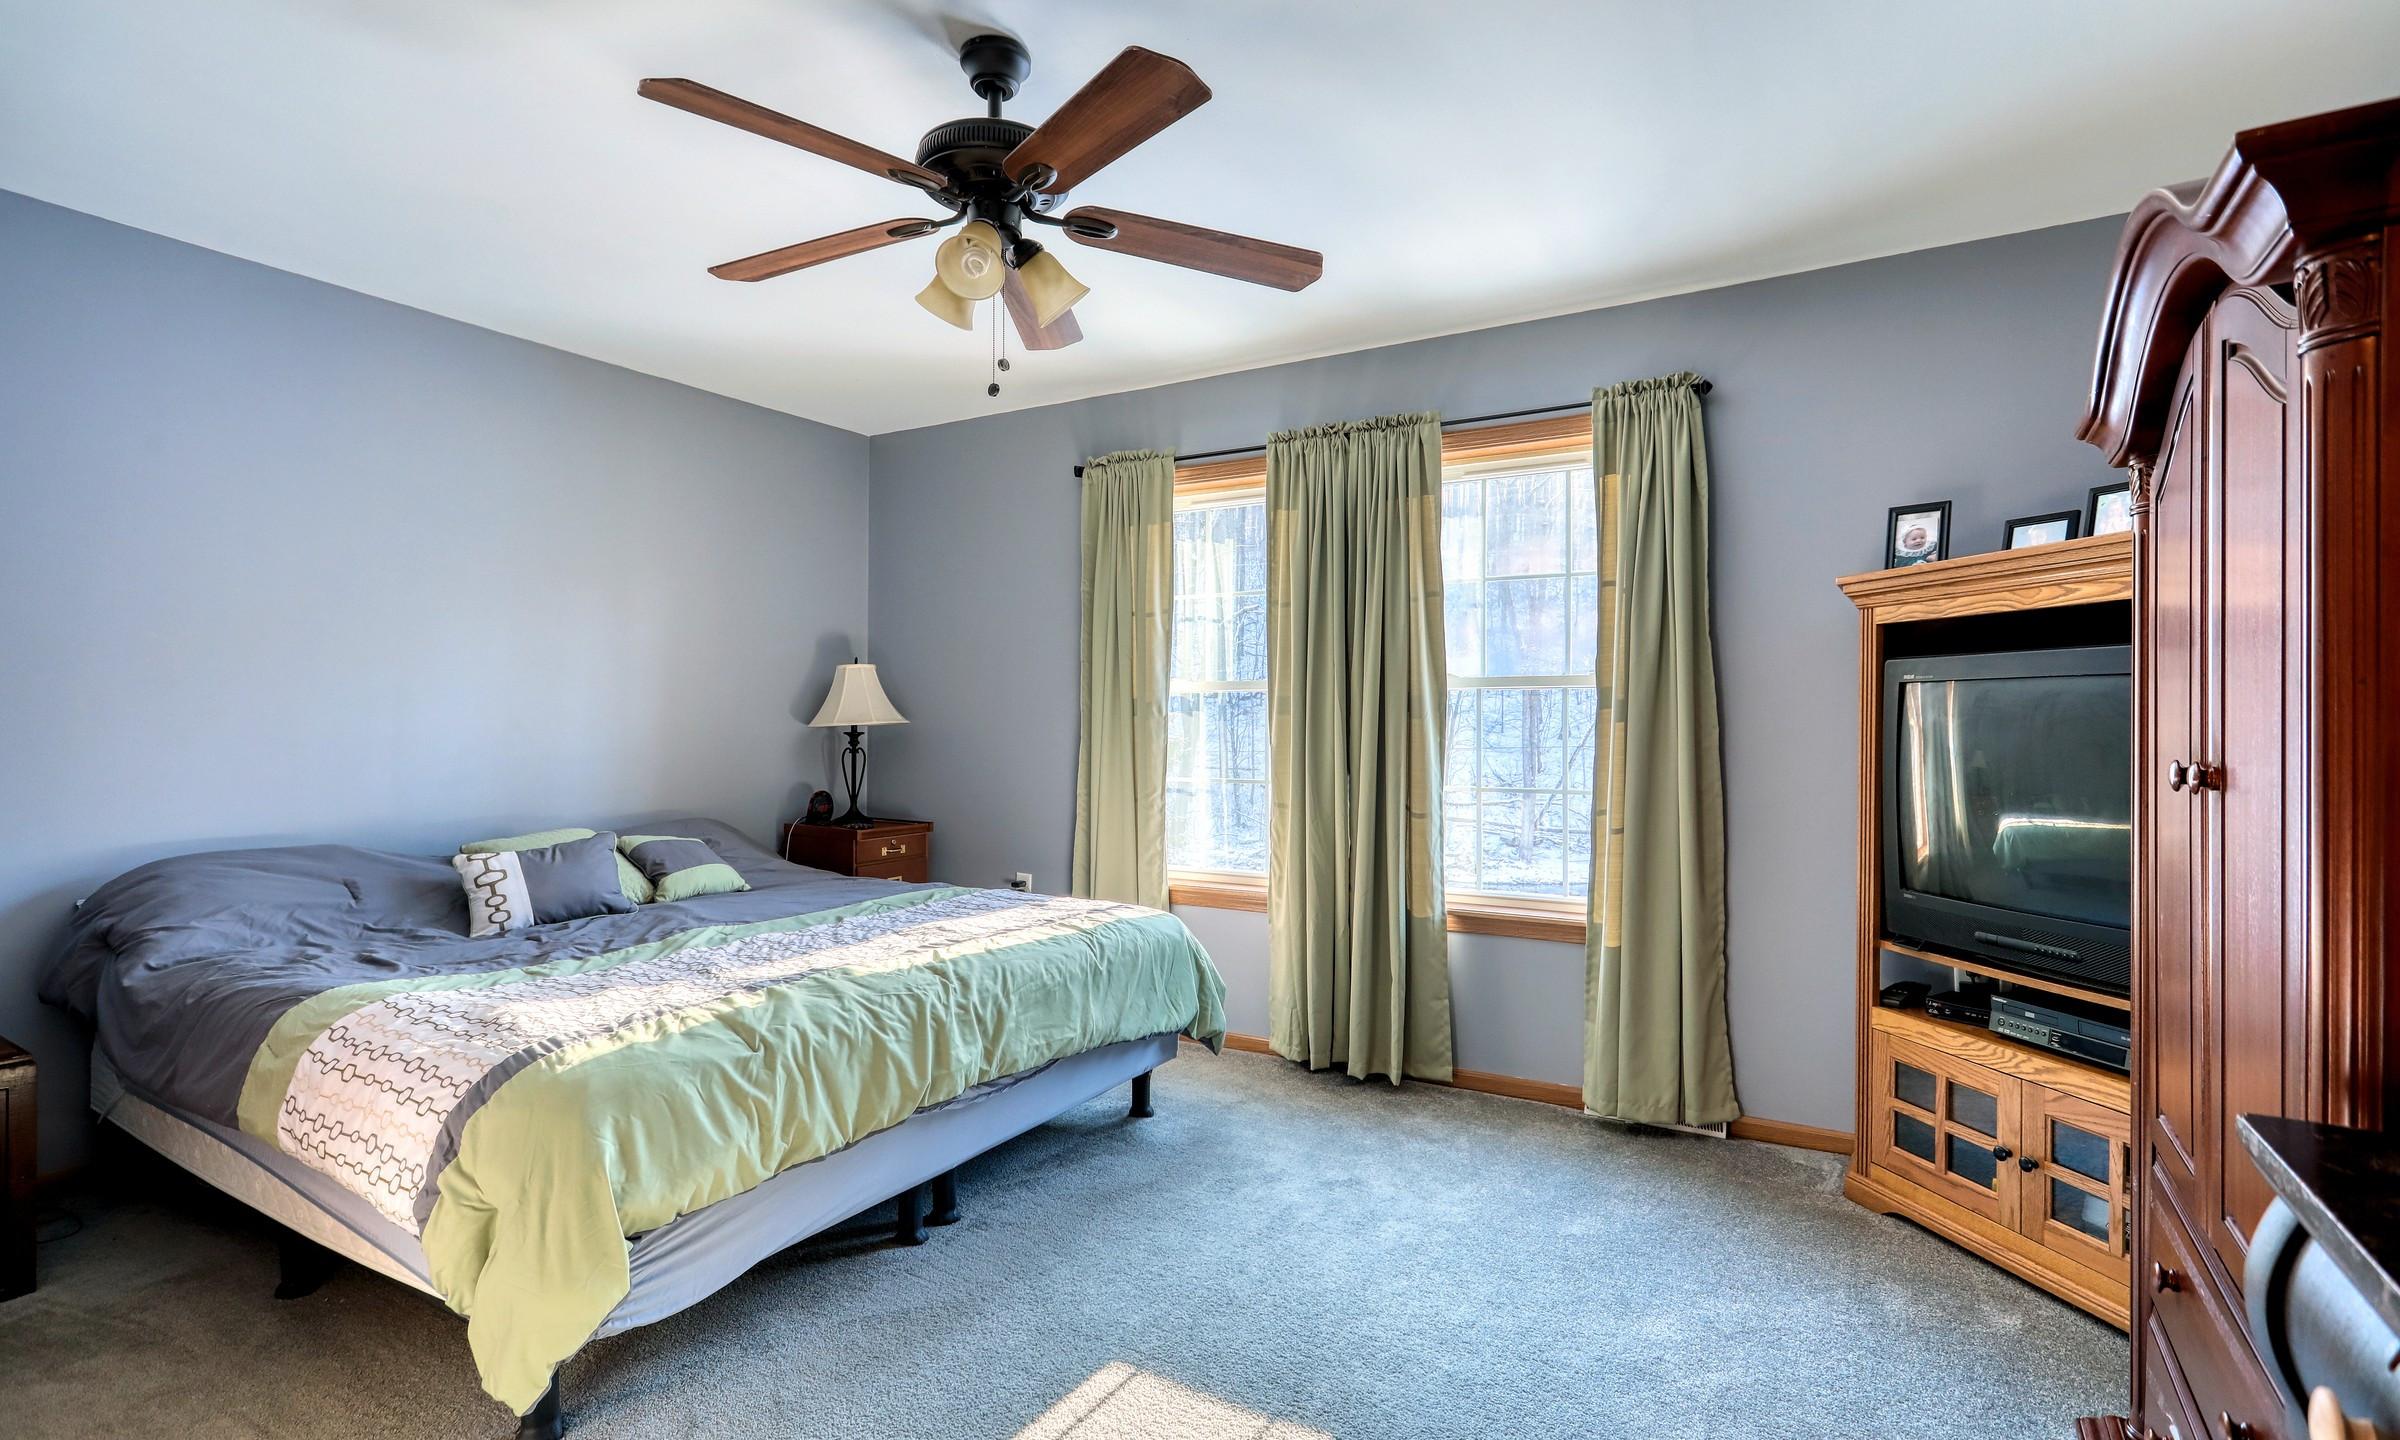 Real Estate Photos in York, PA